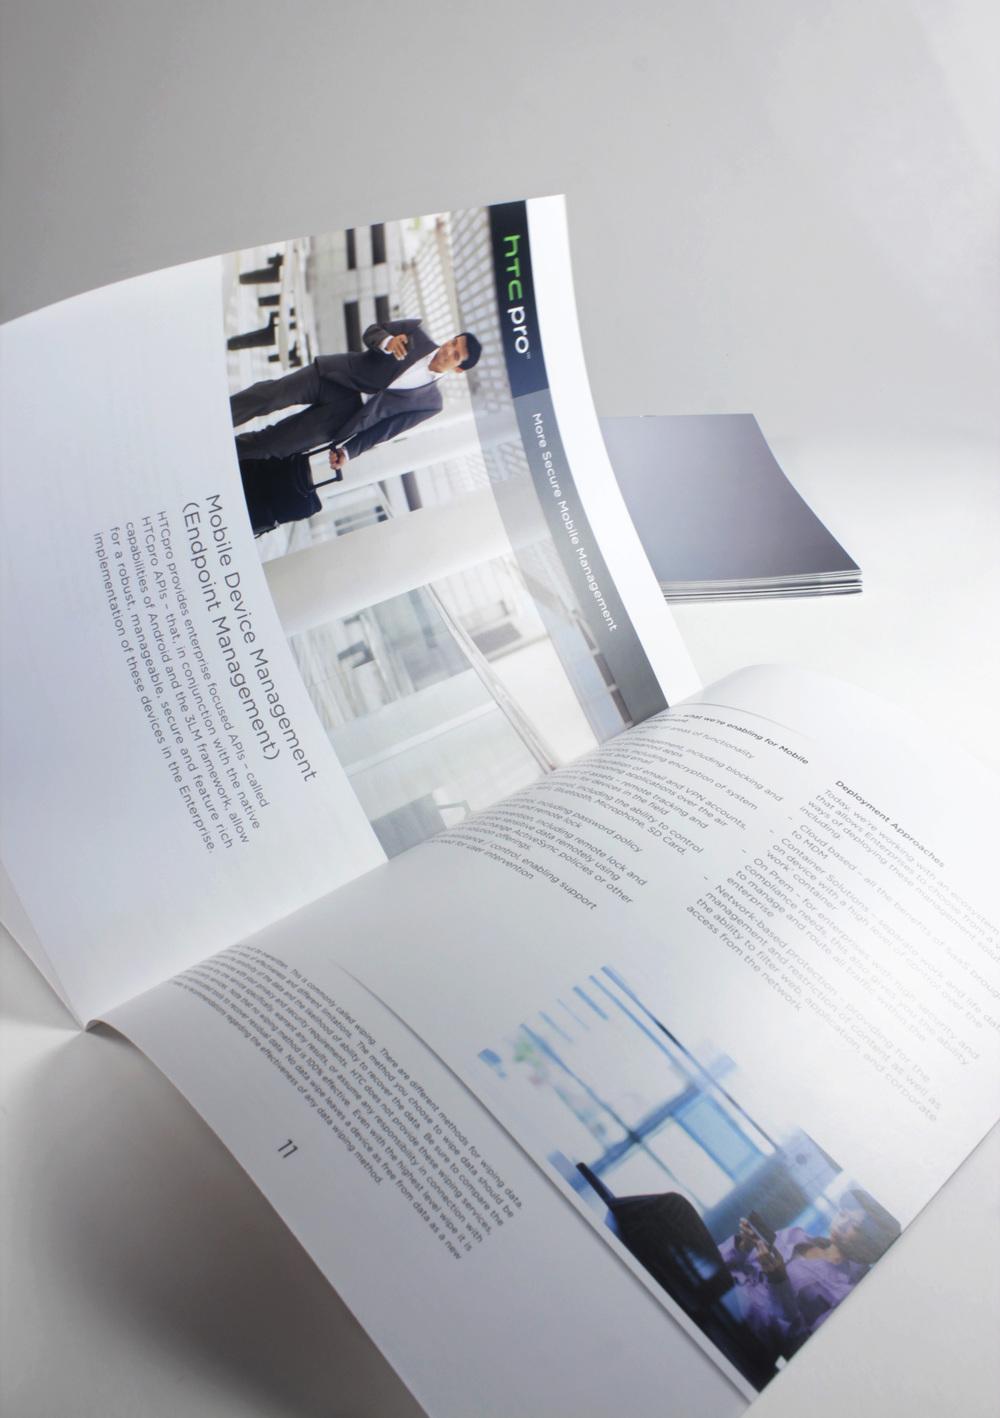 HTC Pro Device Manual Inner Spread